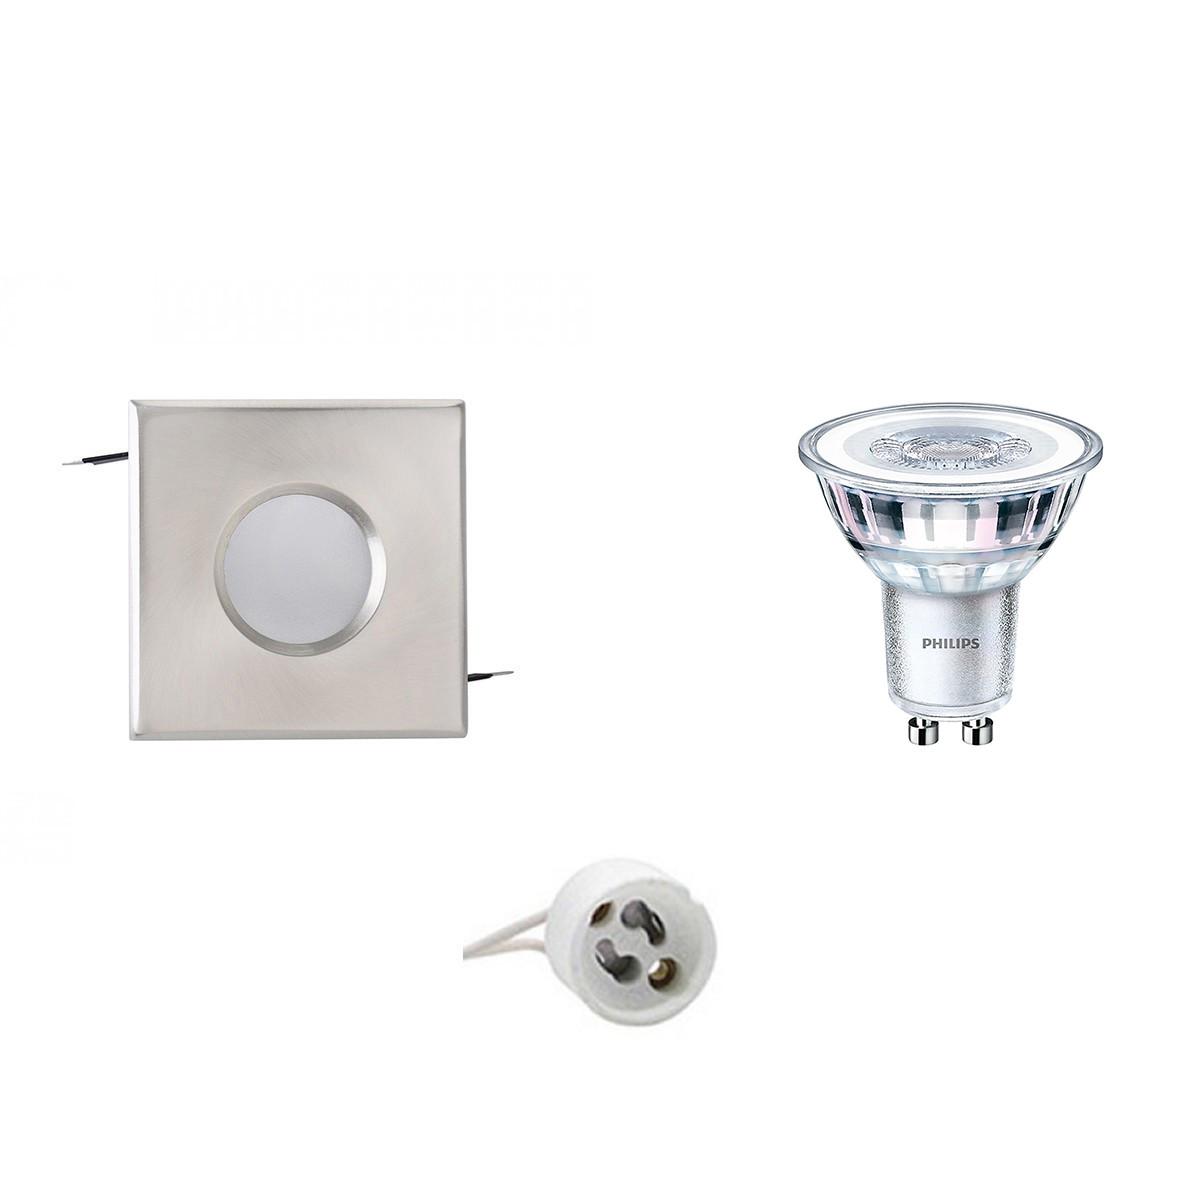 PHILIPS - LED Spot Set - CorePro 827 36D - Aigi - GU10 Fitting - Waterdicht IP65 - Dimbaar - Inbouw